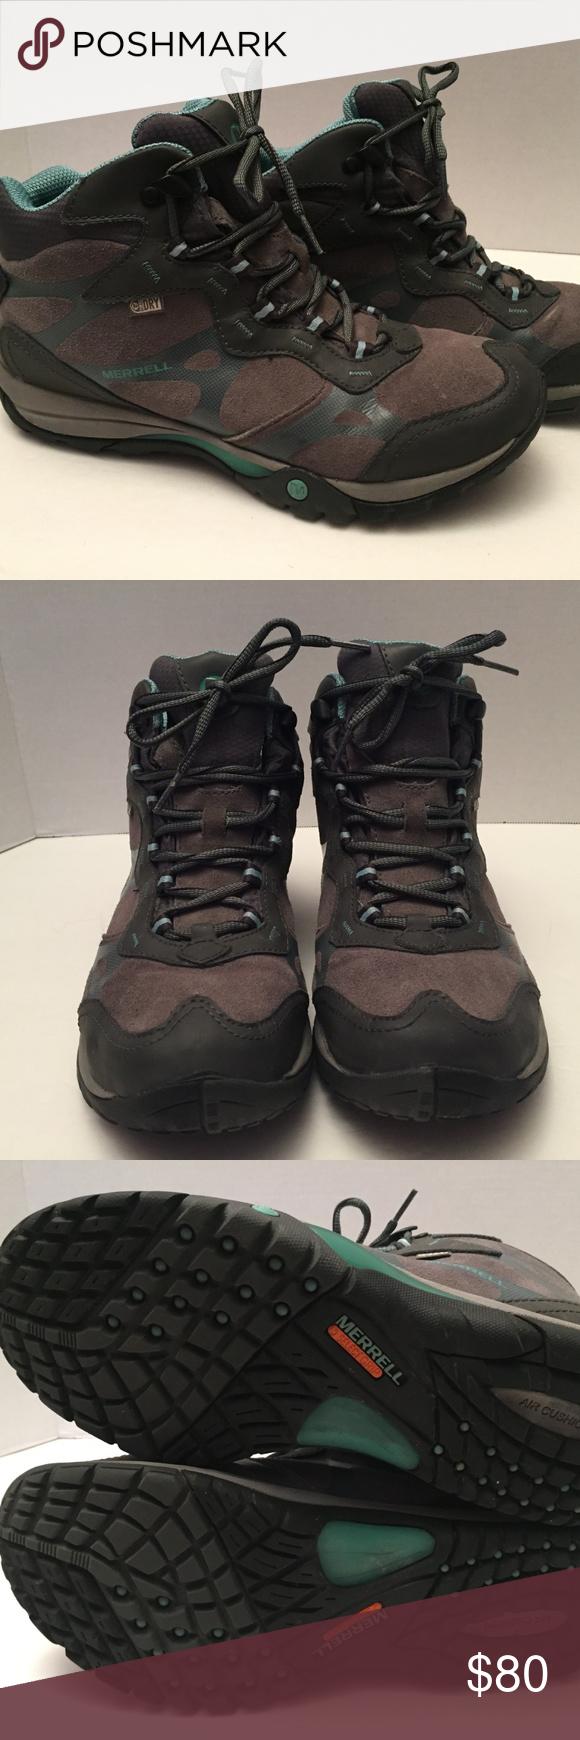 Merrell Select Dry Waterproof Hiking